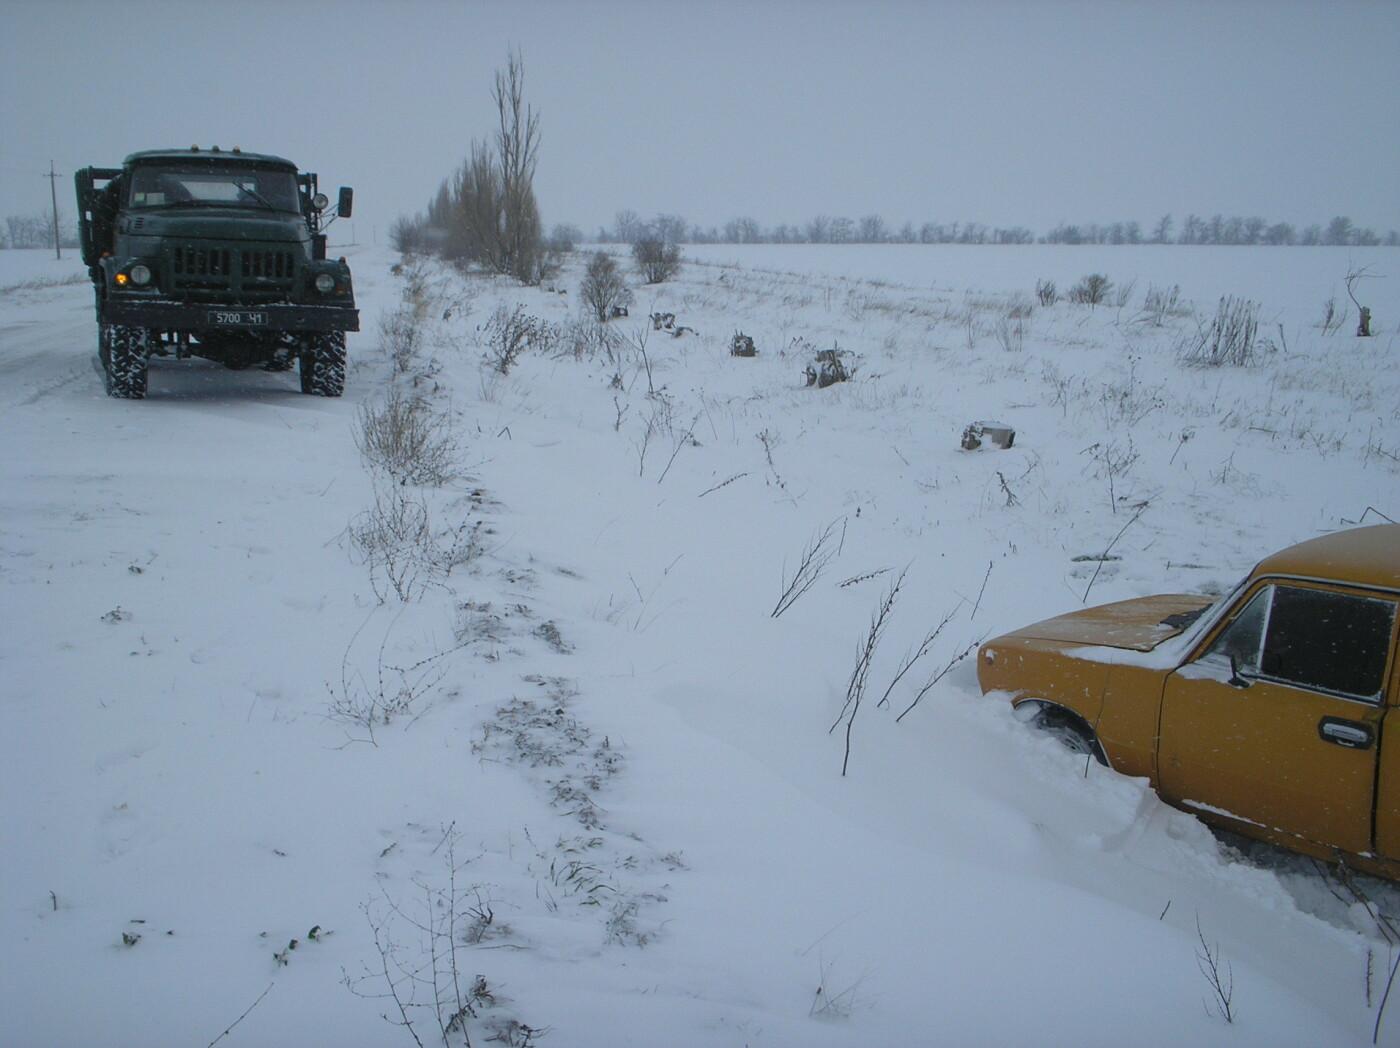 В Запорожской области машина застряла в песке и снегу: доставали спасатели, - ФОТО, фото-4